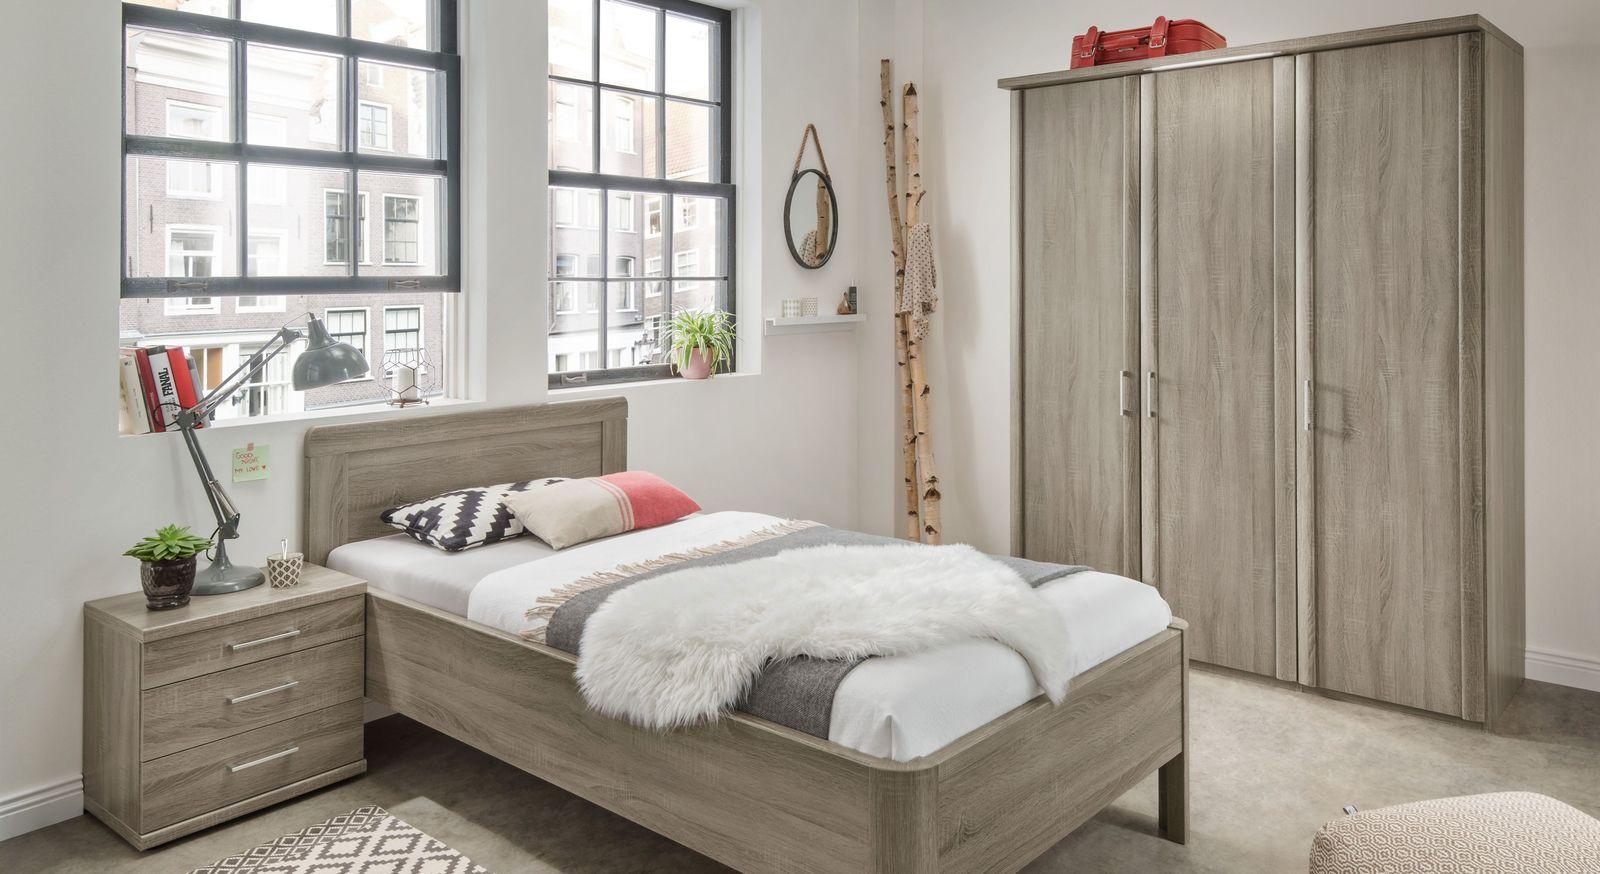 Baur Schlafzimmer Komplett Böhmerwald Bettdecken Erfahrung Tapeten